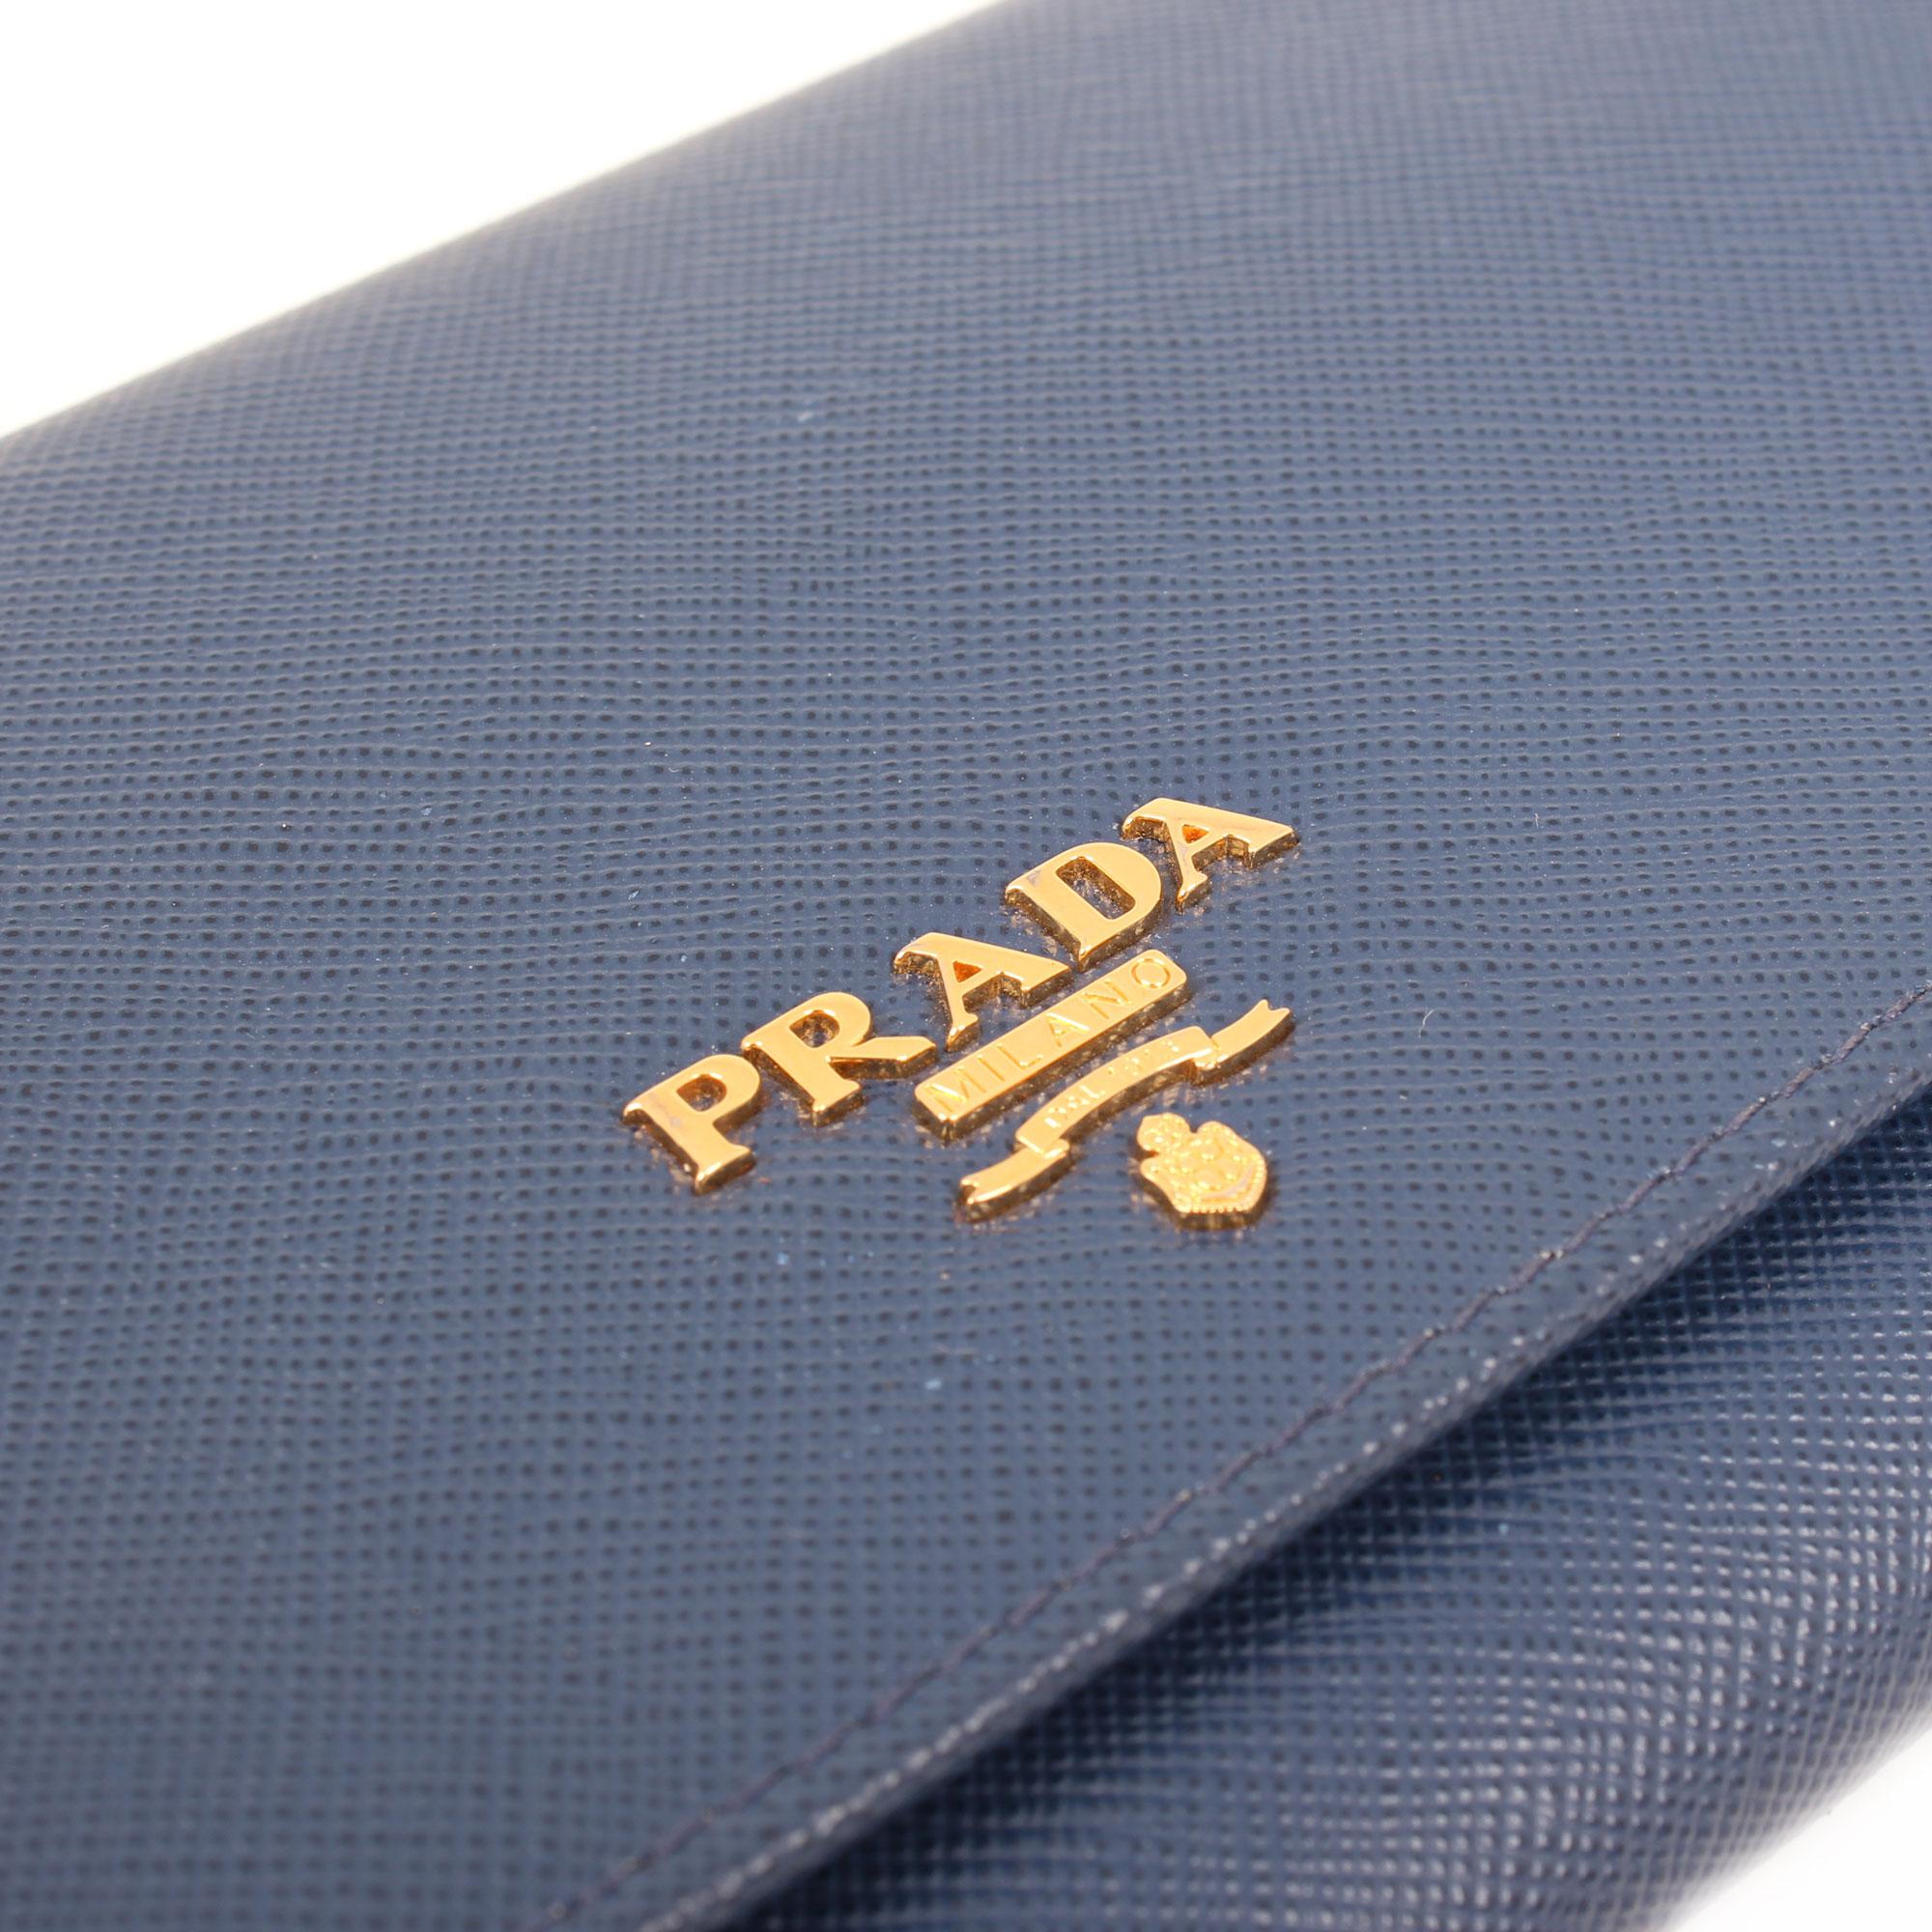 bolso-prada-wallet-on-chain-saffiano-metal-bluette-azul-logo